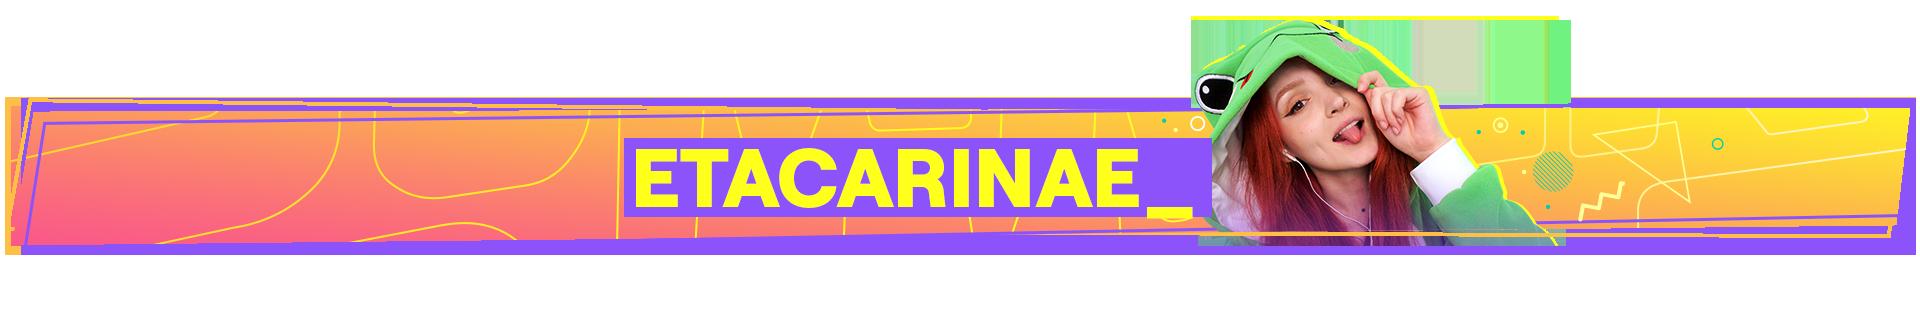 TR_SR_Capt_Support_Image_1080px_Etacarinae_.png